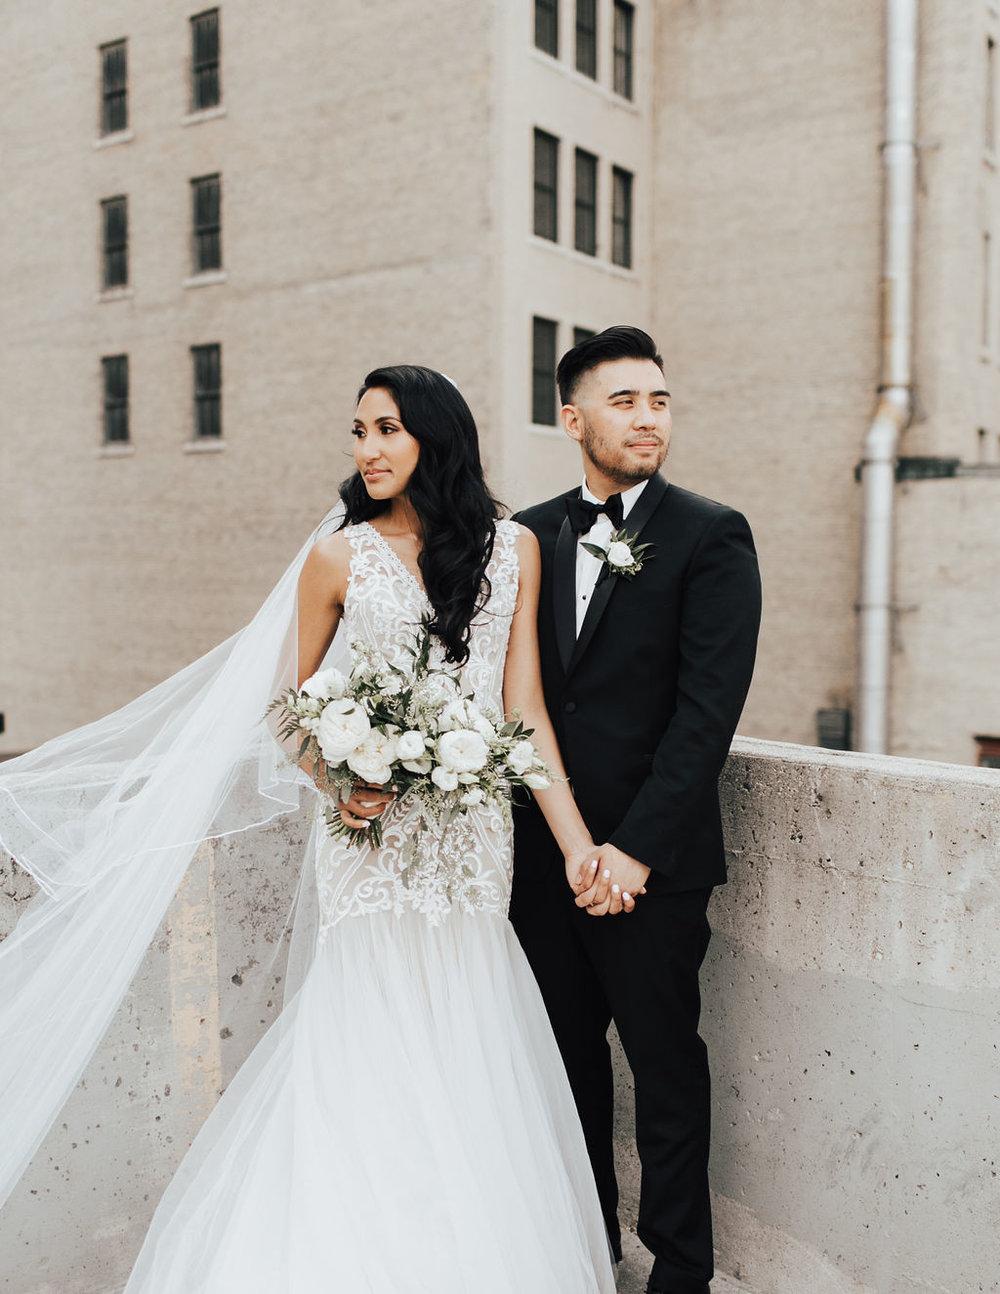 Modern and Organic Wedding in Winnipeg - Stone House Creative